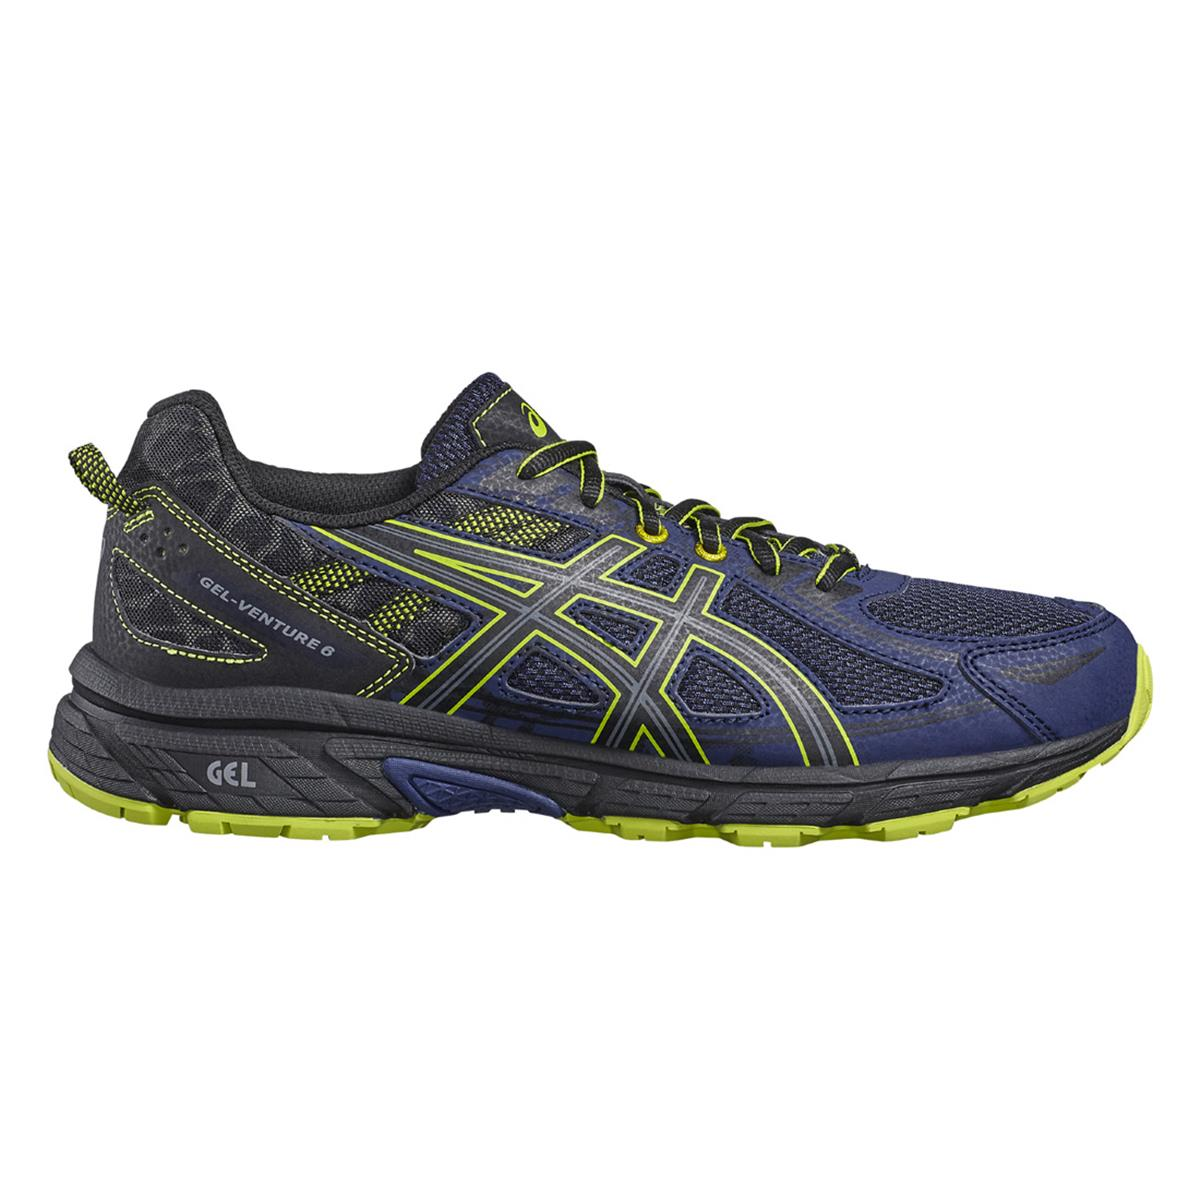 Asics Venture 6 Mens Trail Running Shoes (Indigo